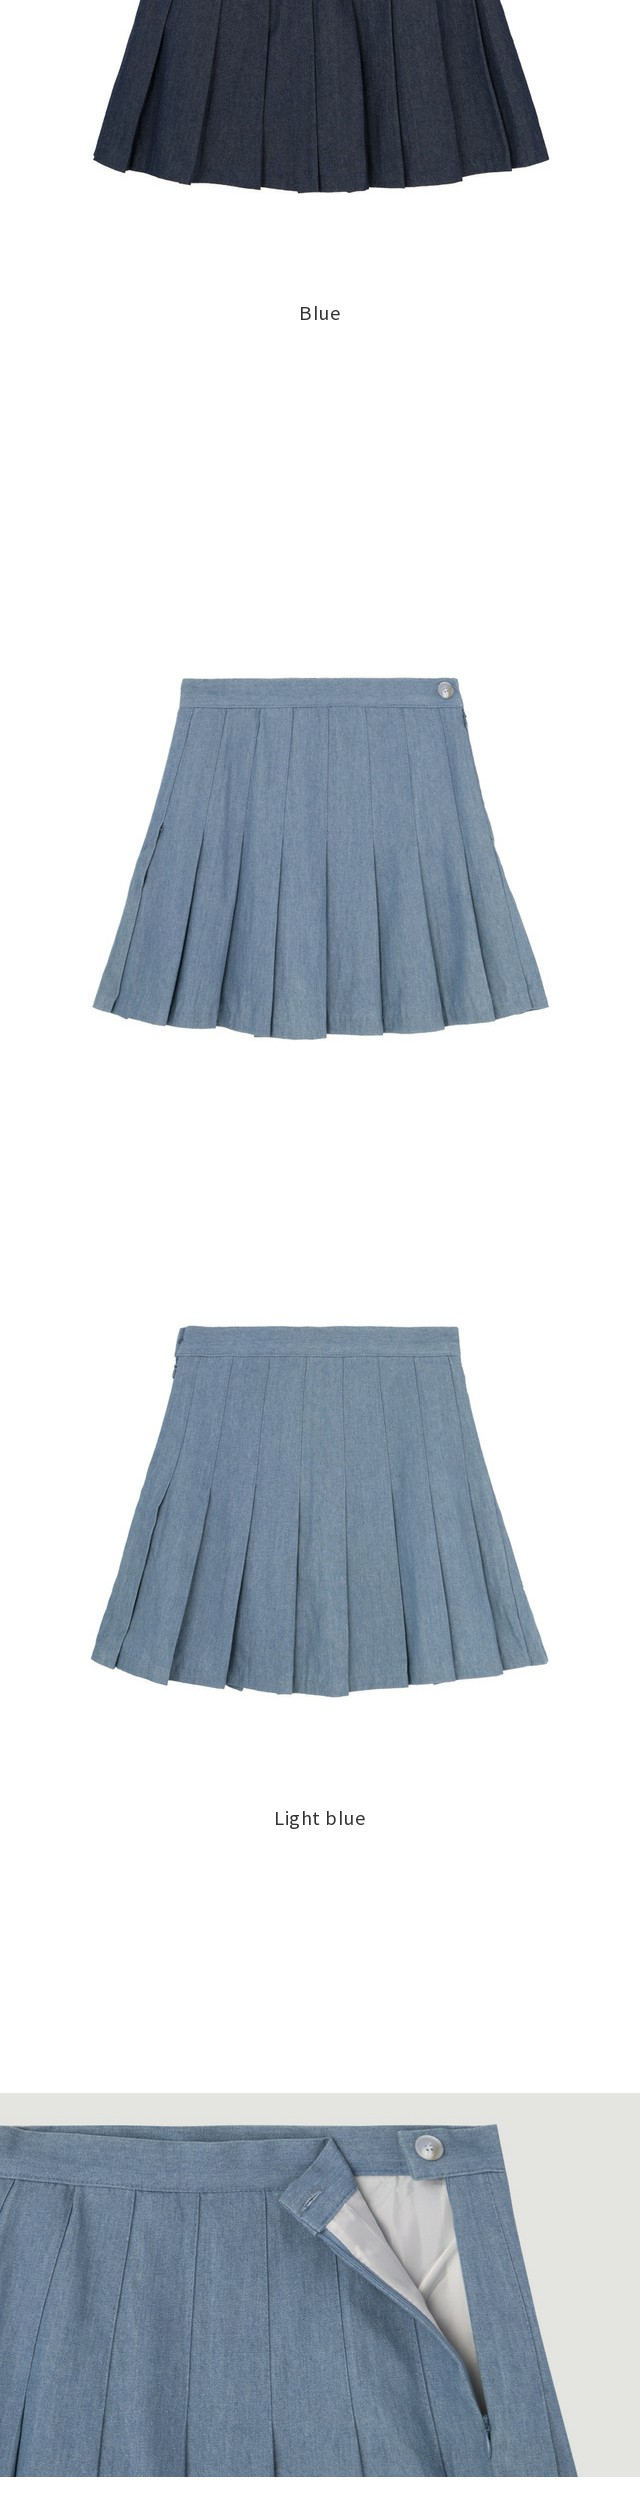 Rubber denim tennis skirt